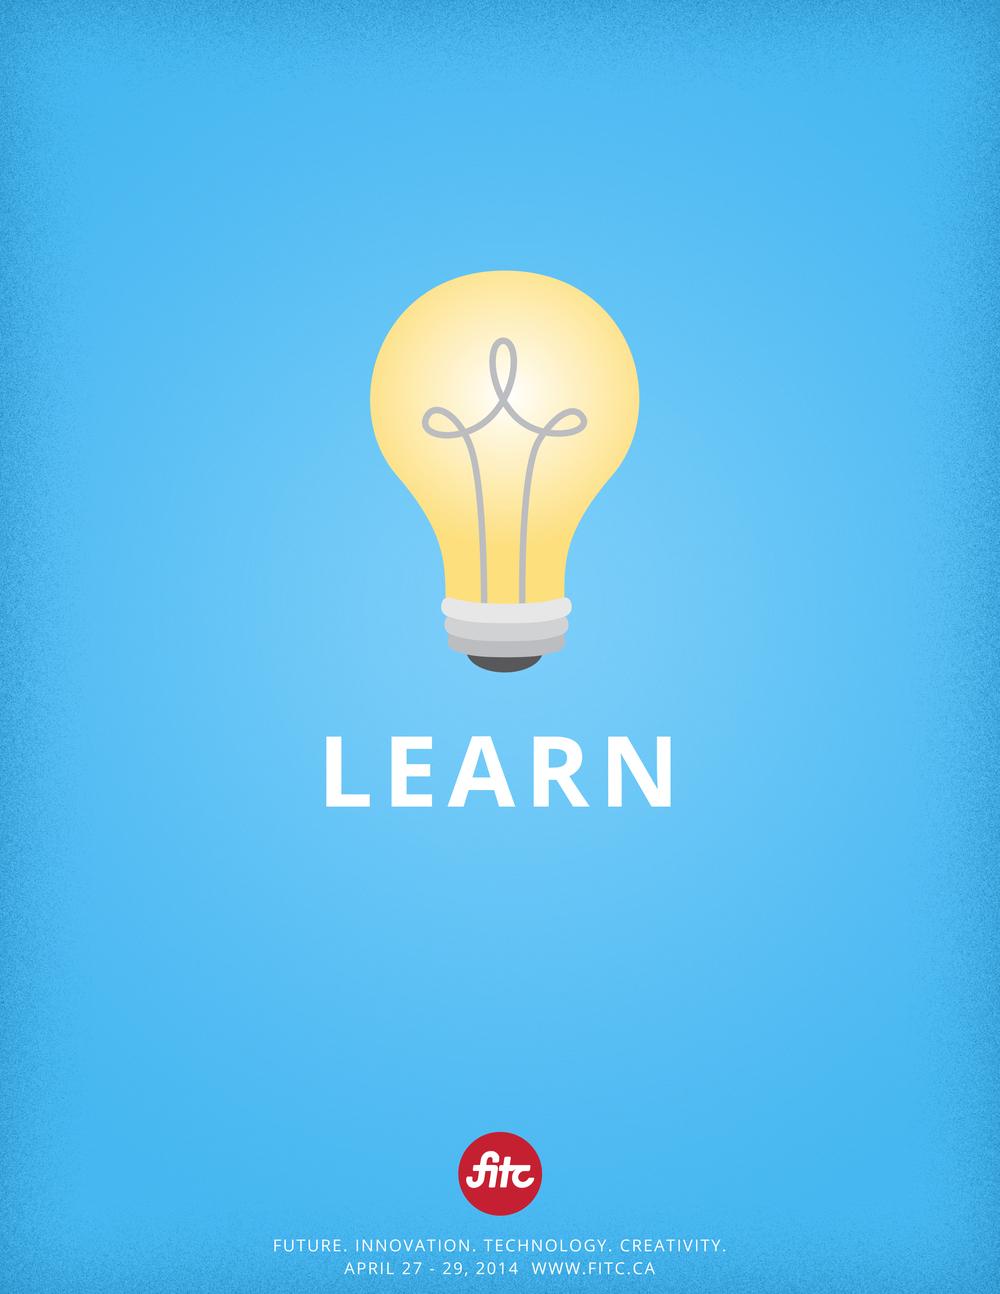 fitc_learn.jpg